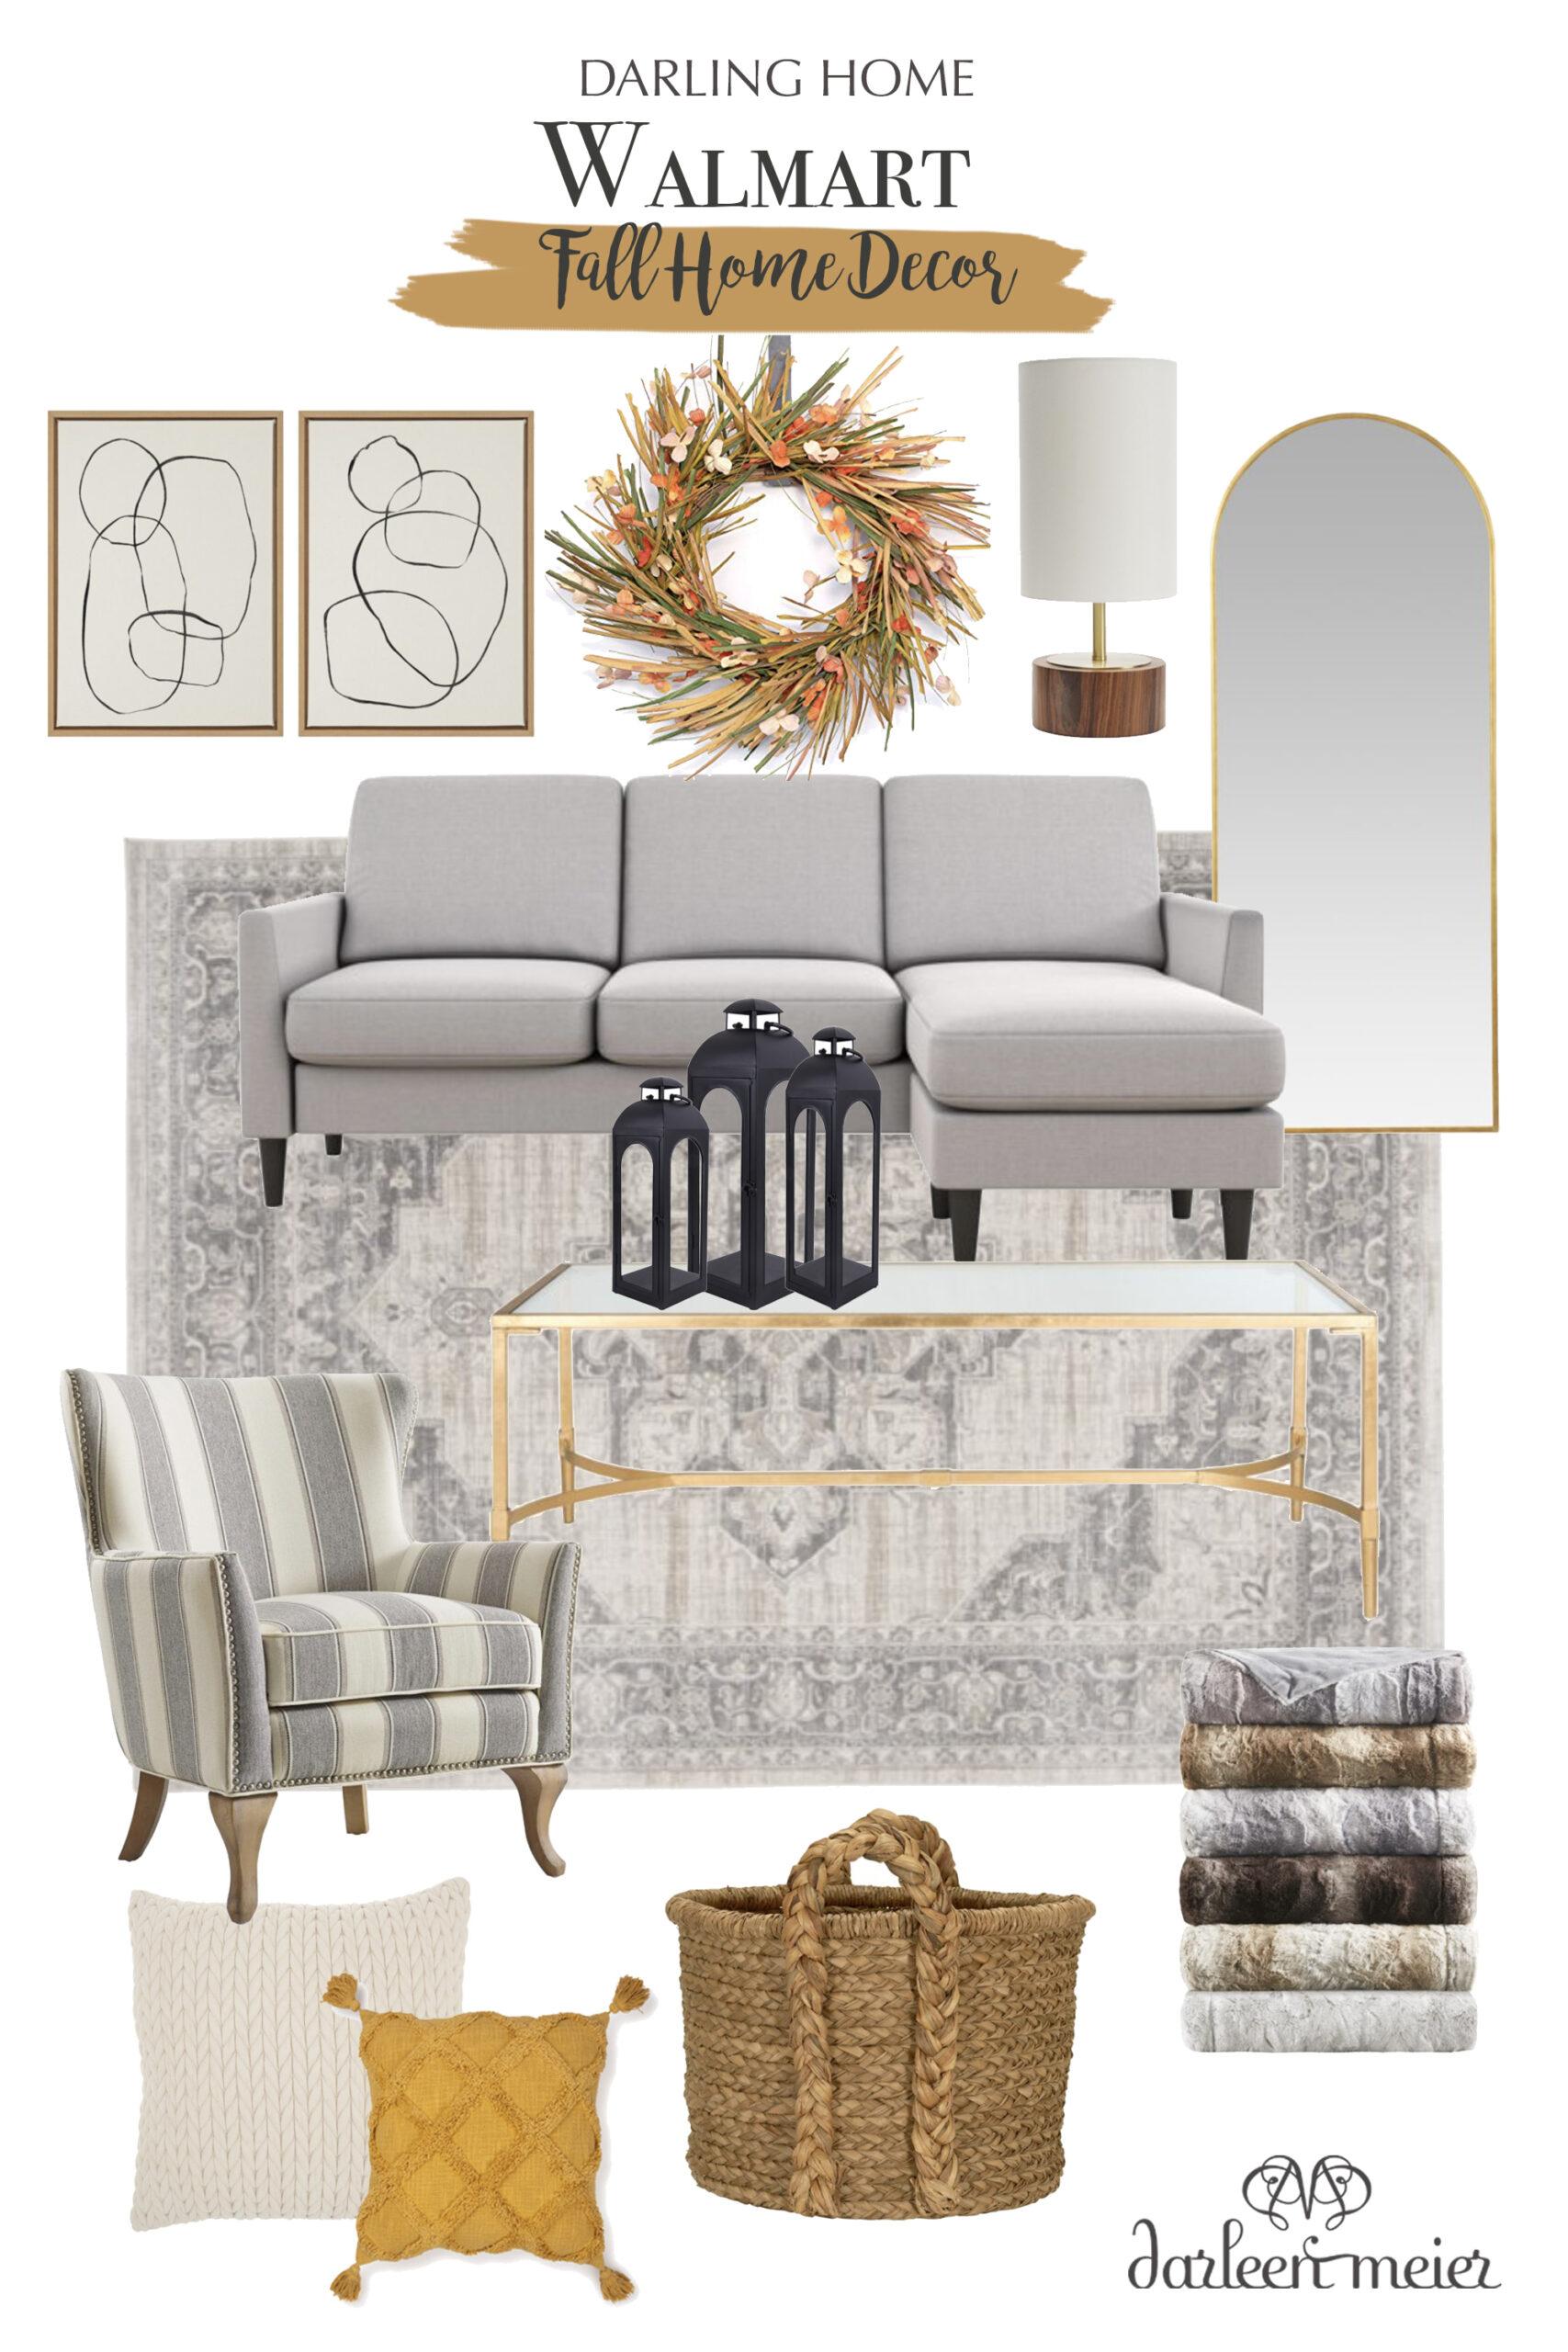 Budget-friendly fall home decor, Walmart fall home decor, Walmart home | Darling Darleen Top Lifestyle Blogger